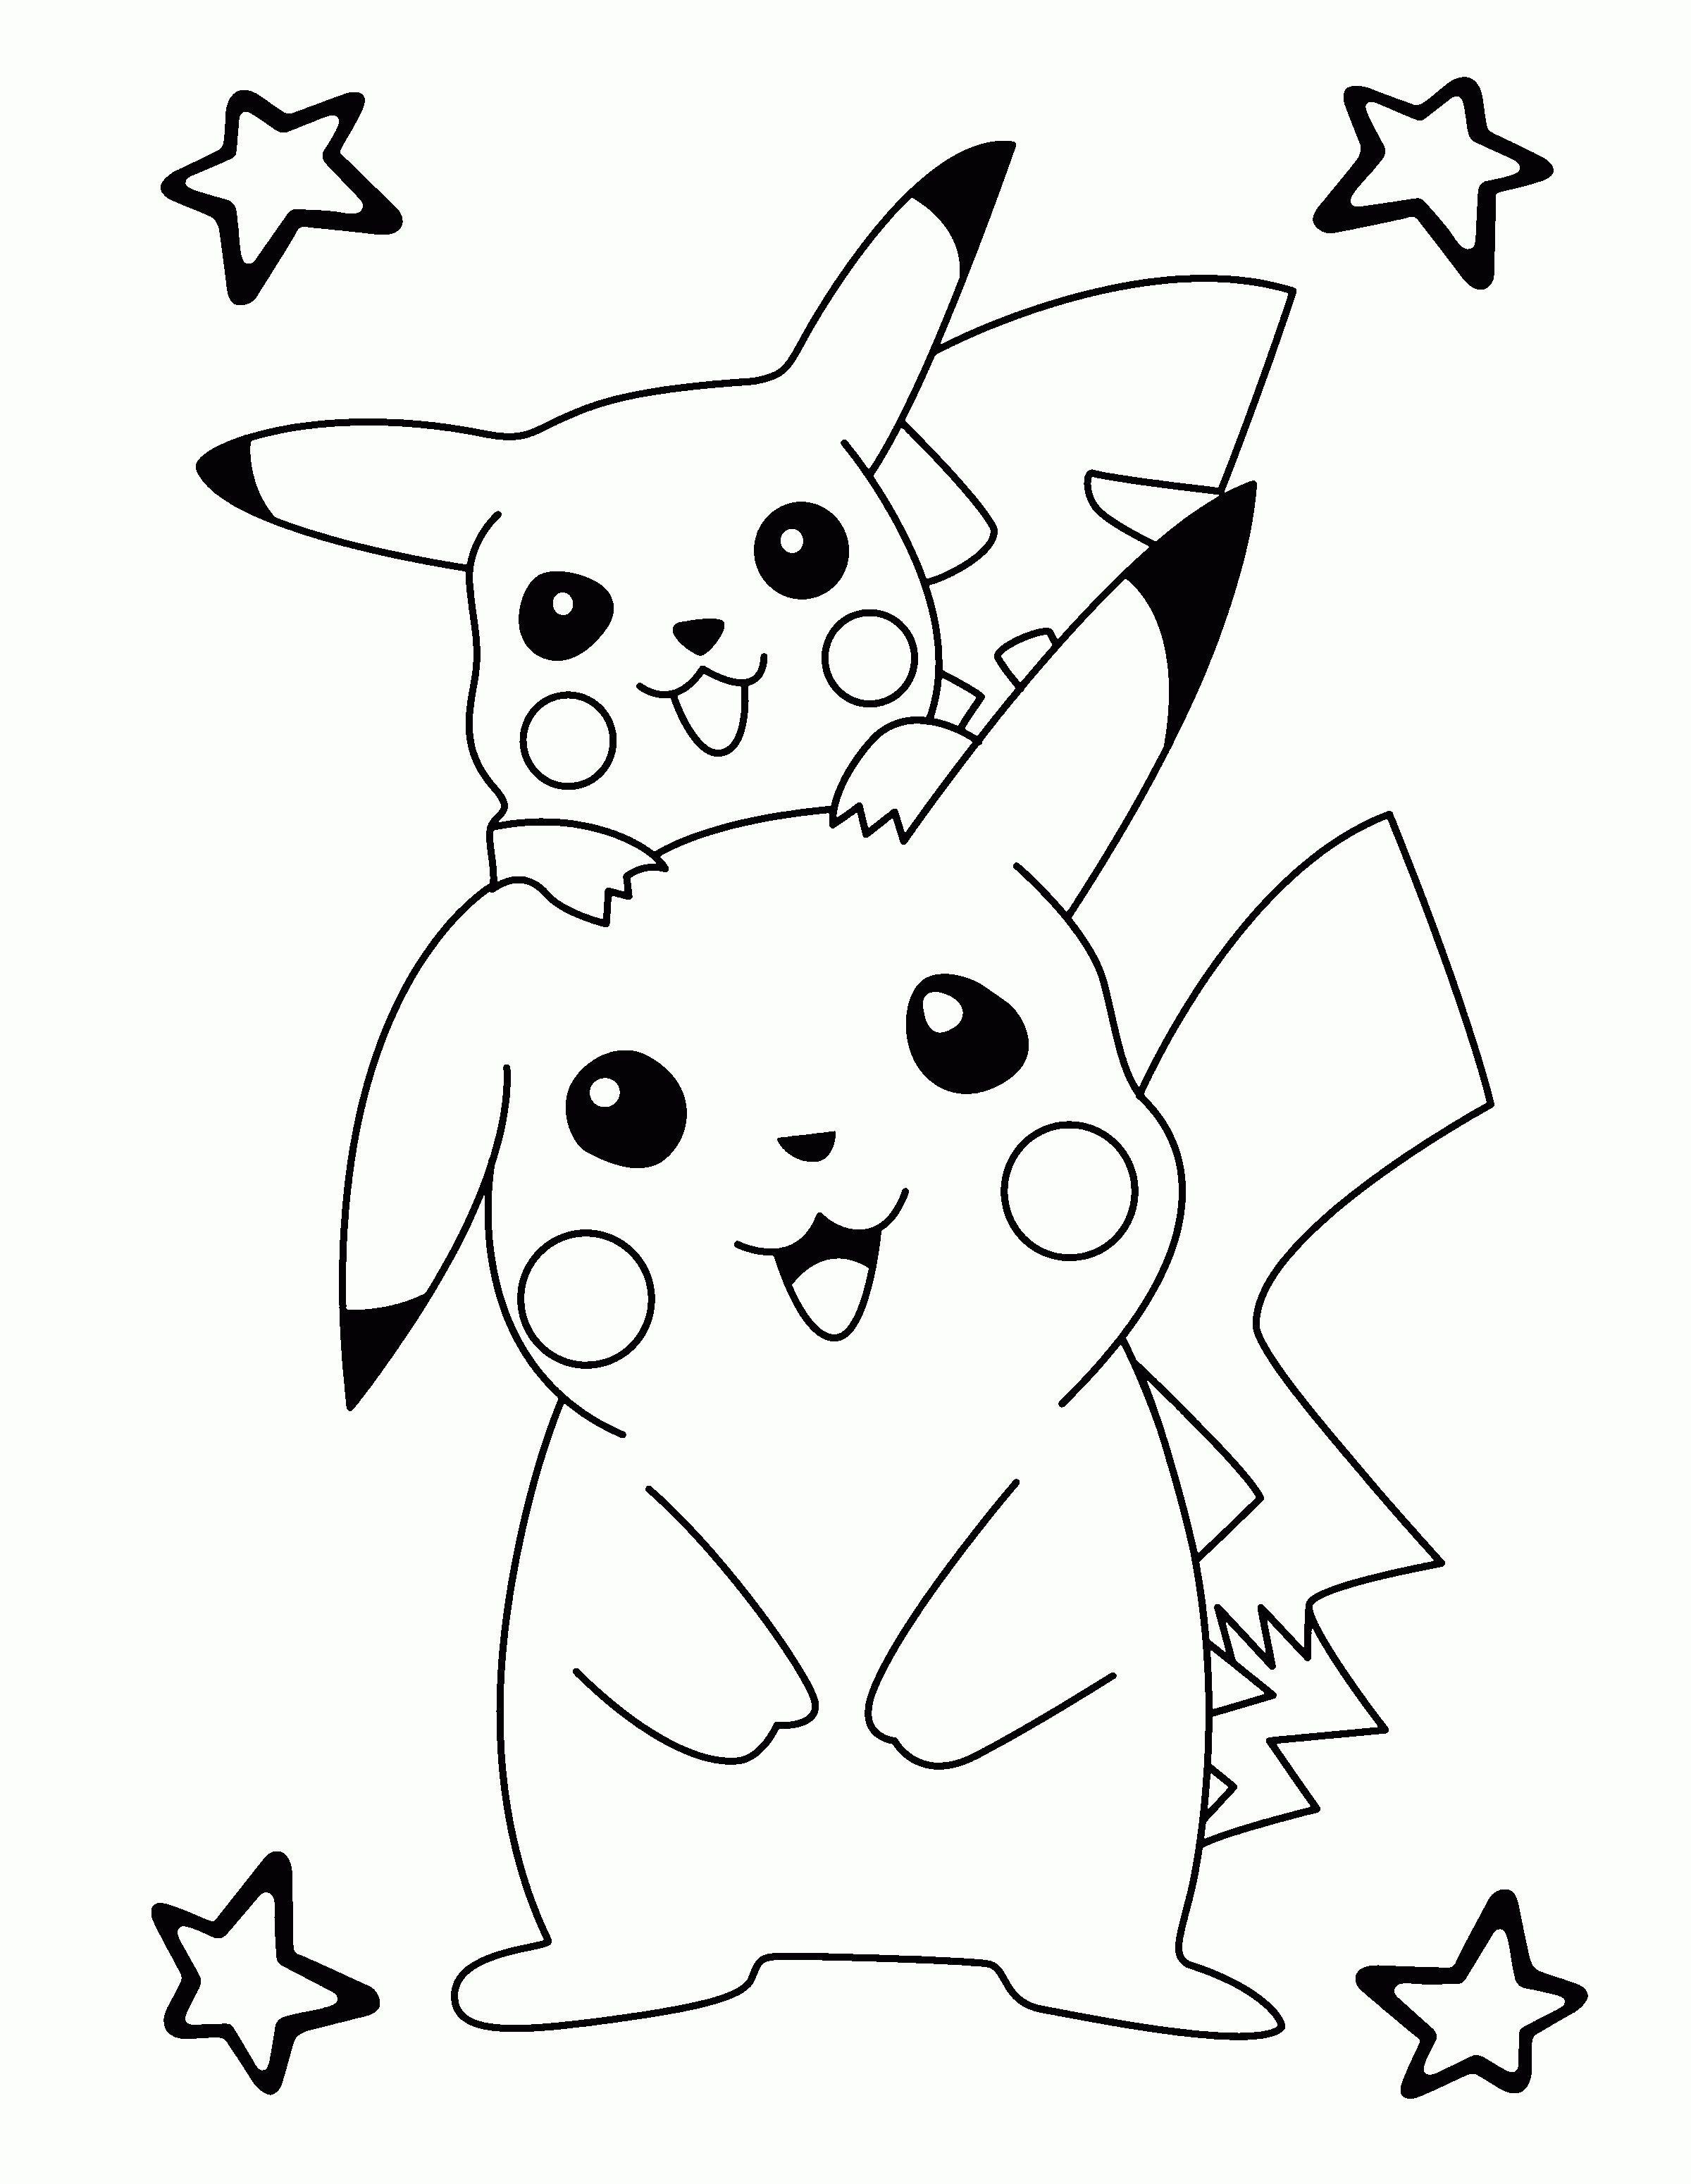 Ausmalbilder Pokemon Xy Genial Ausmalbild Pikachu Pokemon John Pinte T Fotos